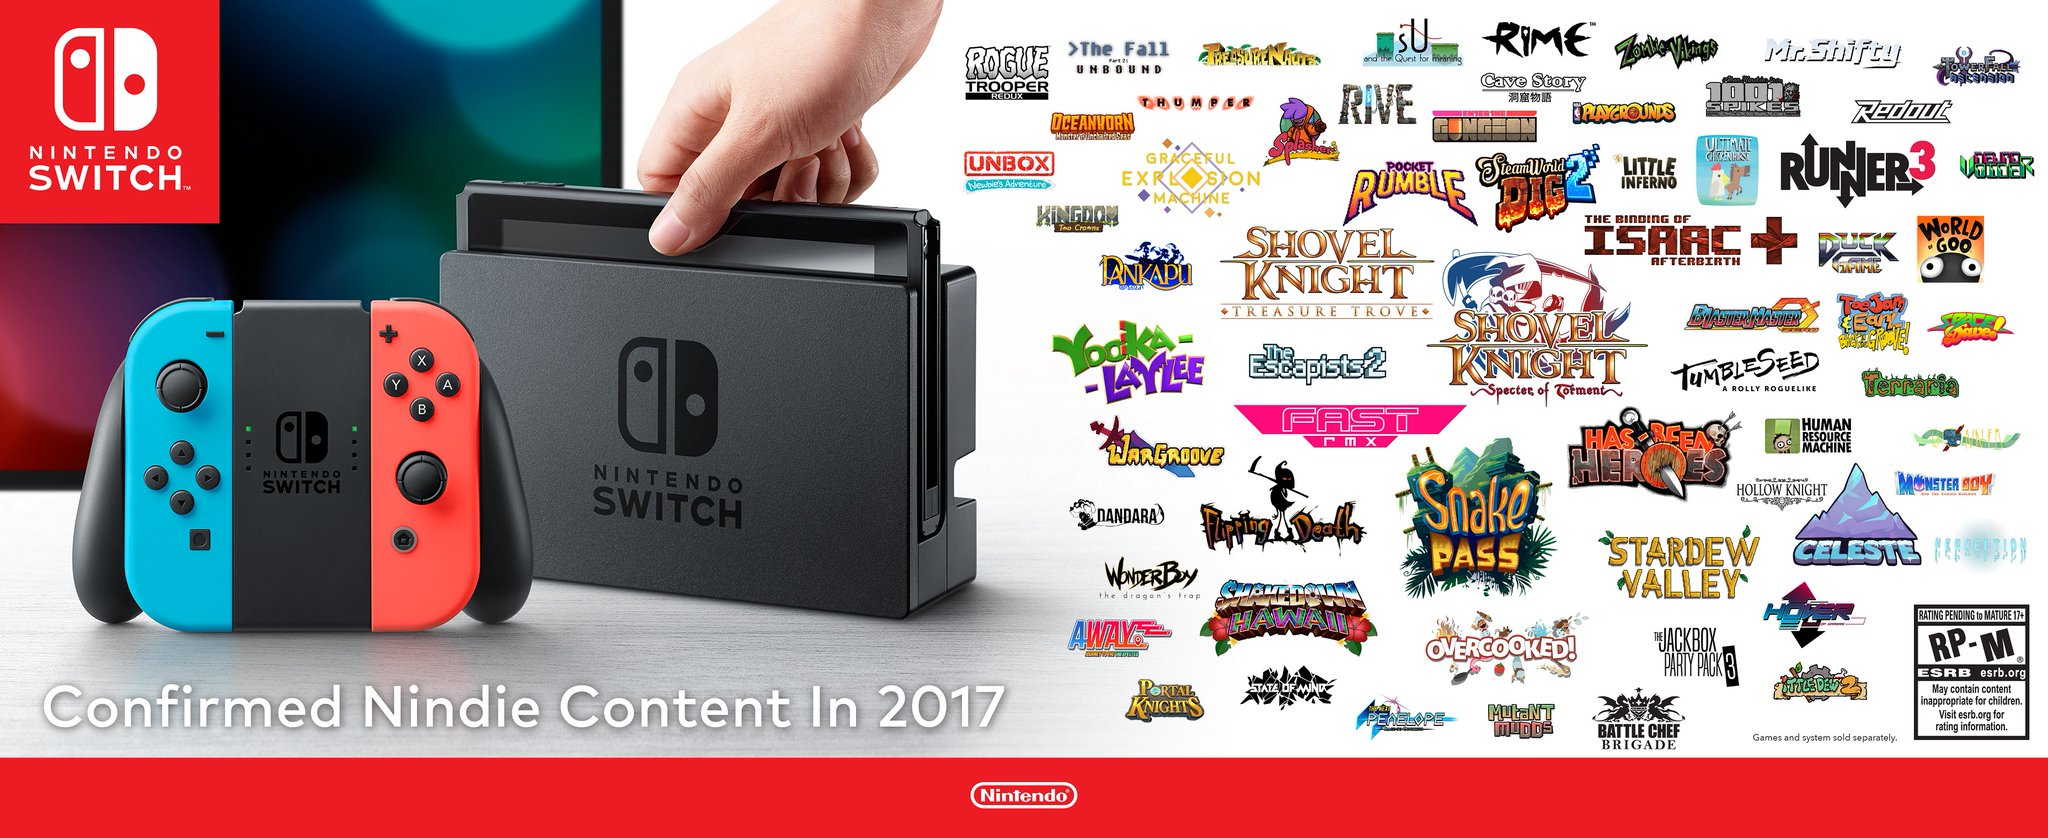 Nindies - Showcase Nintendo Switch